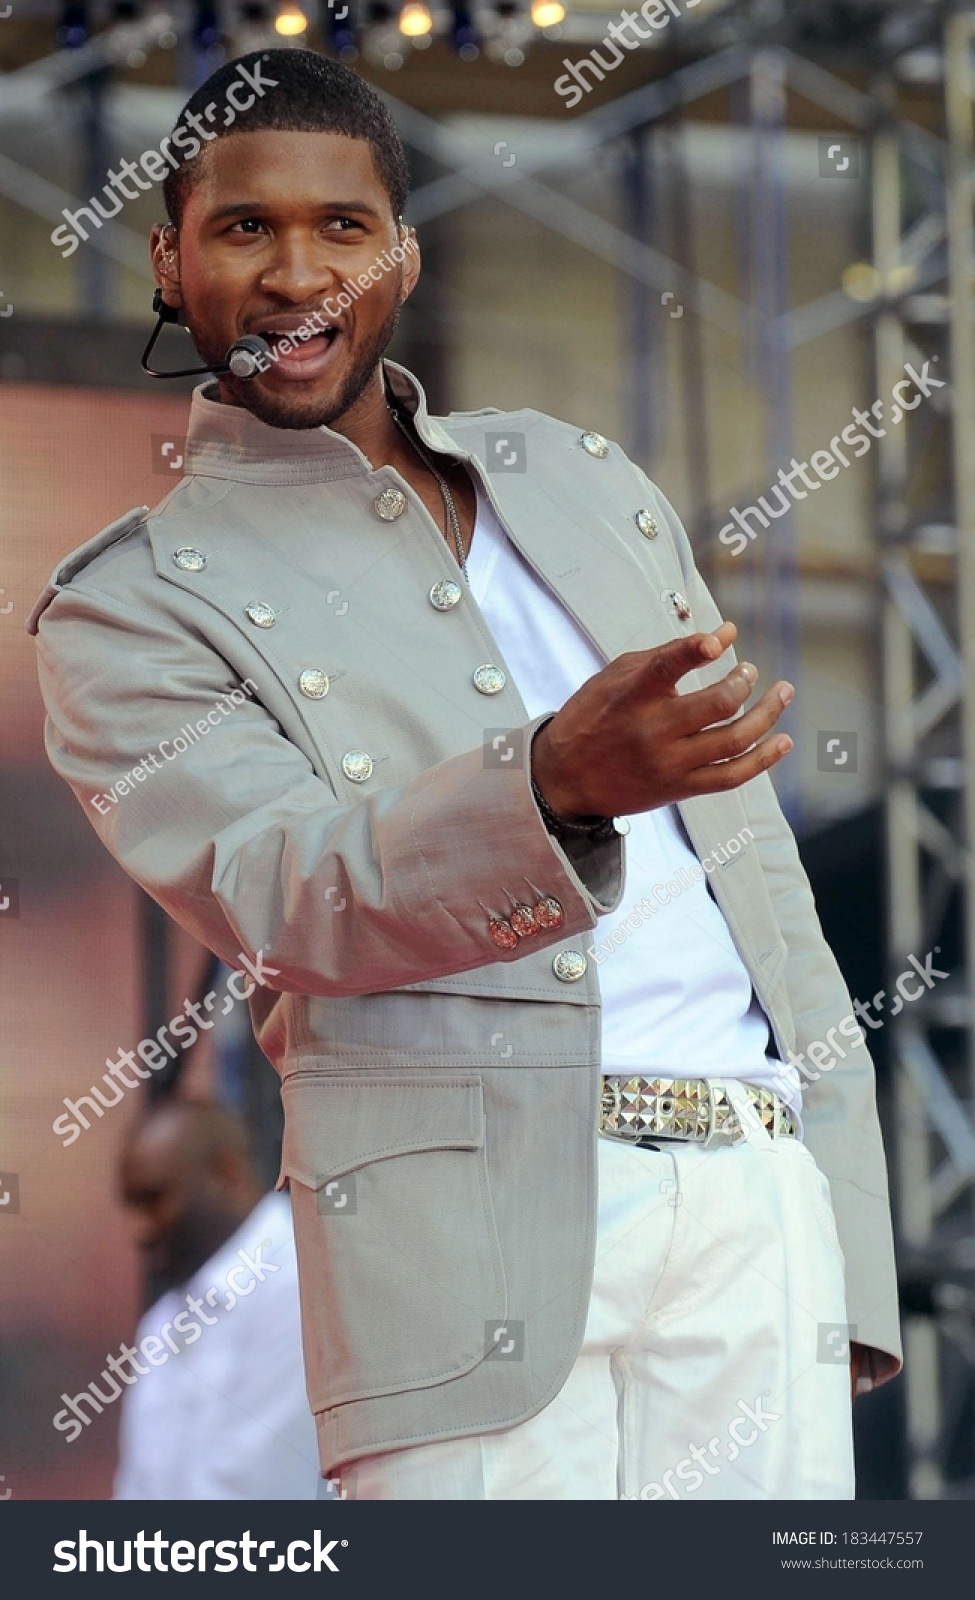 Usher On Stage Abc Gma Concert Celebrities Stock Image 183447557